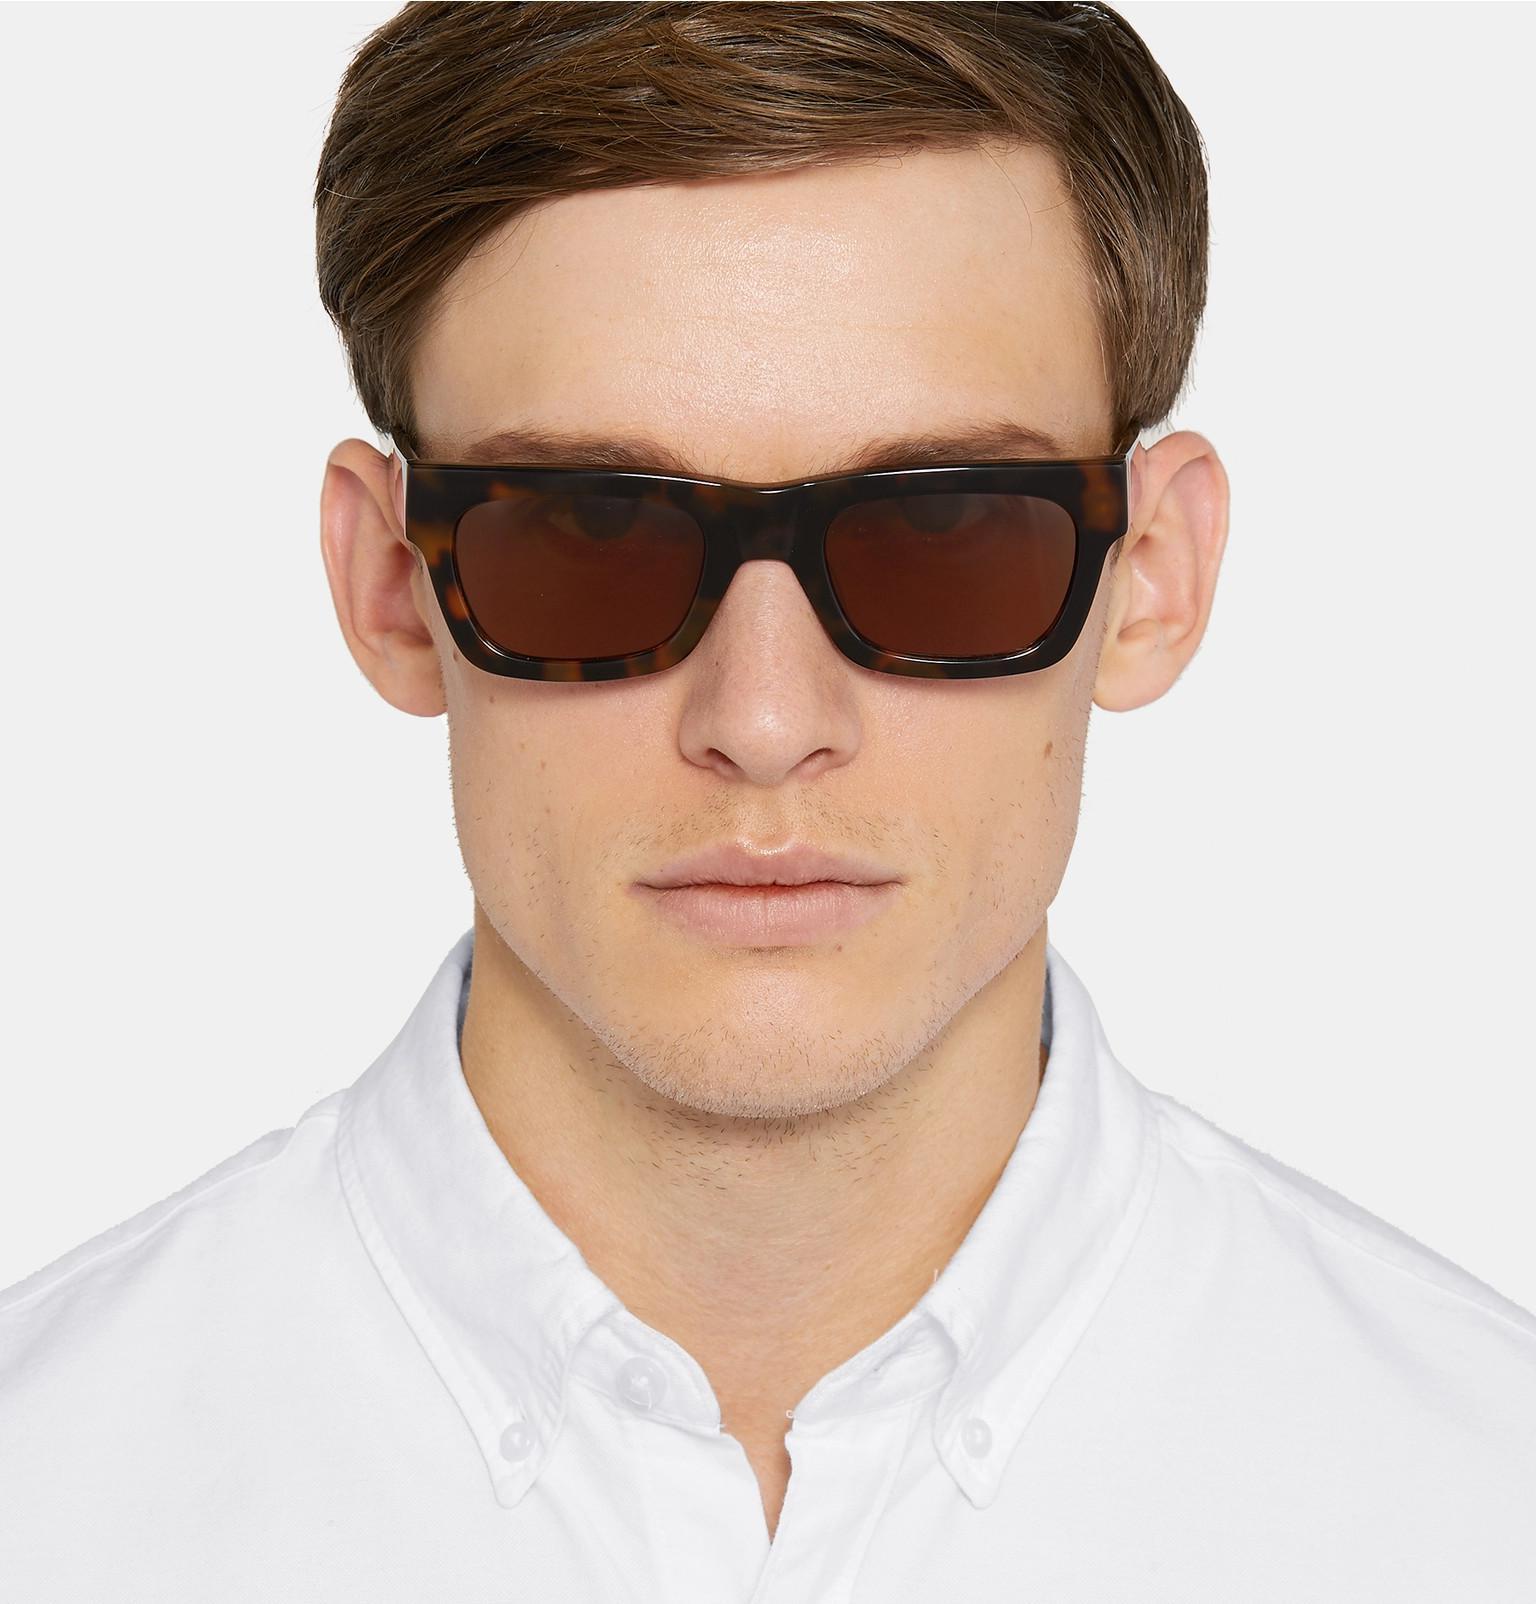 1690264cbf33 Sun Buddies Greta Square-frame Tortoiseshell Acetate Sunglasses in ...